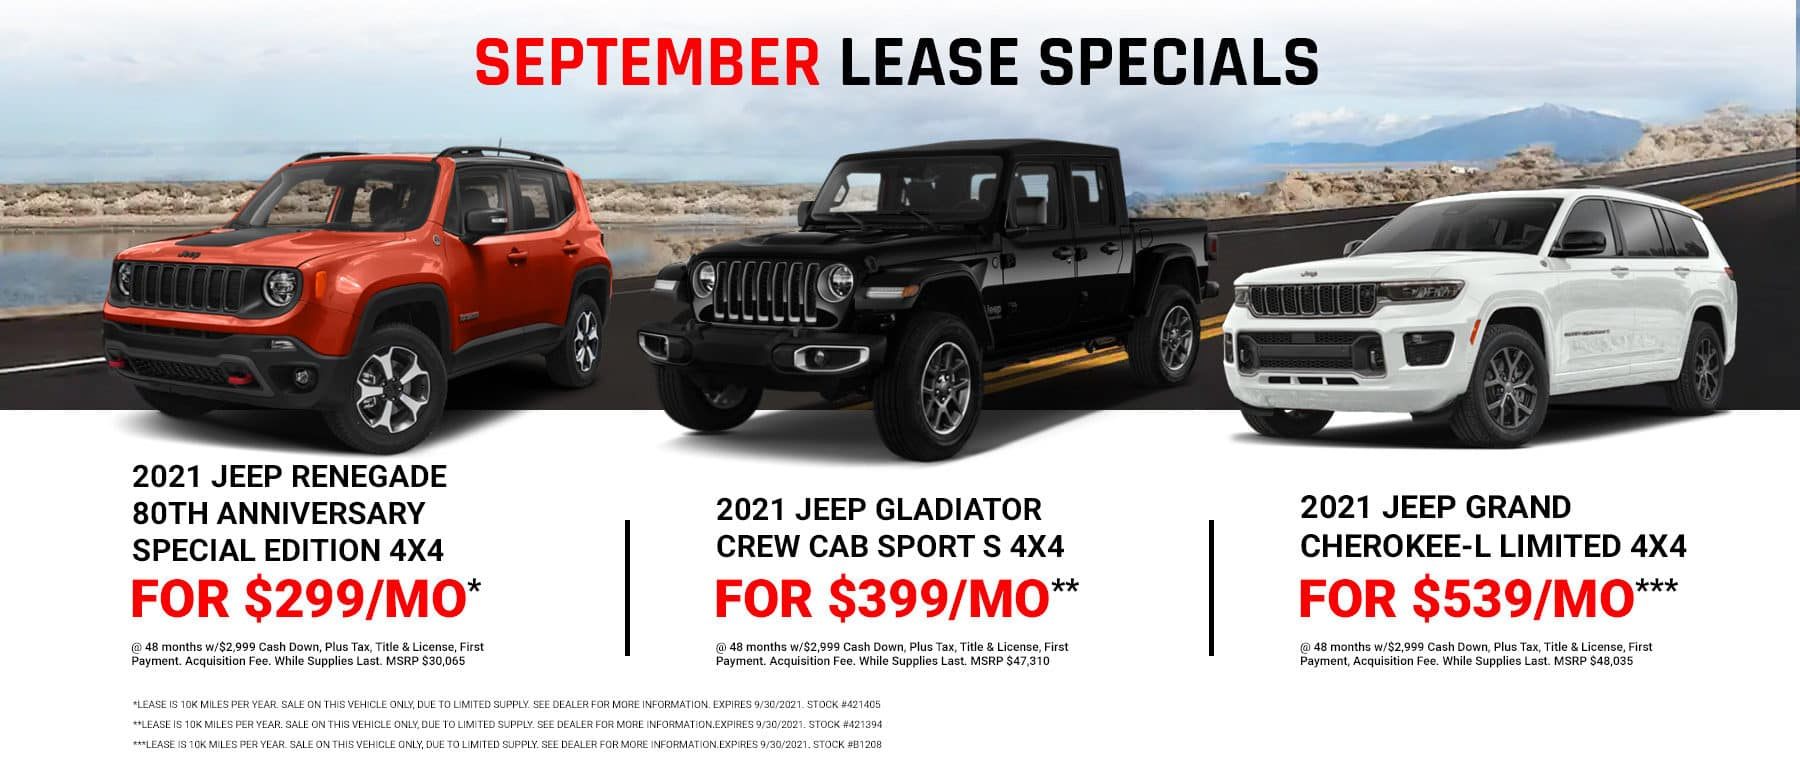 September Lease Specials